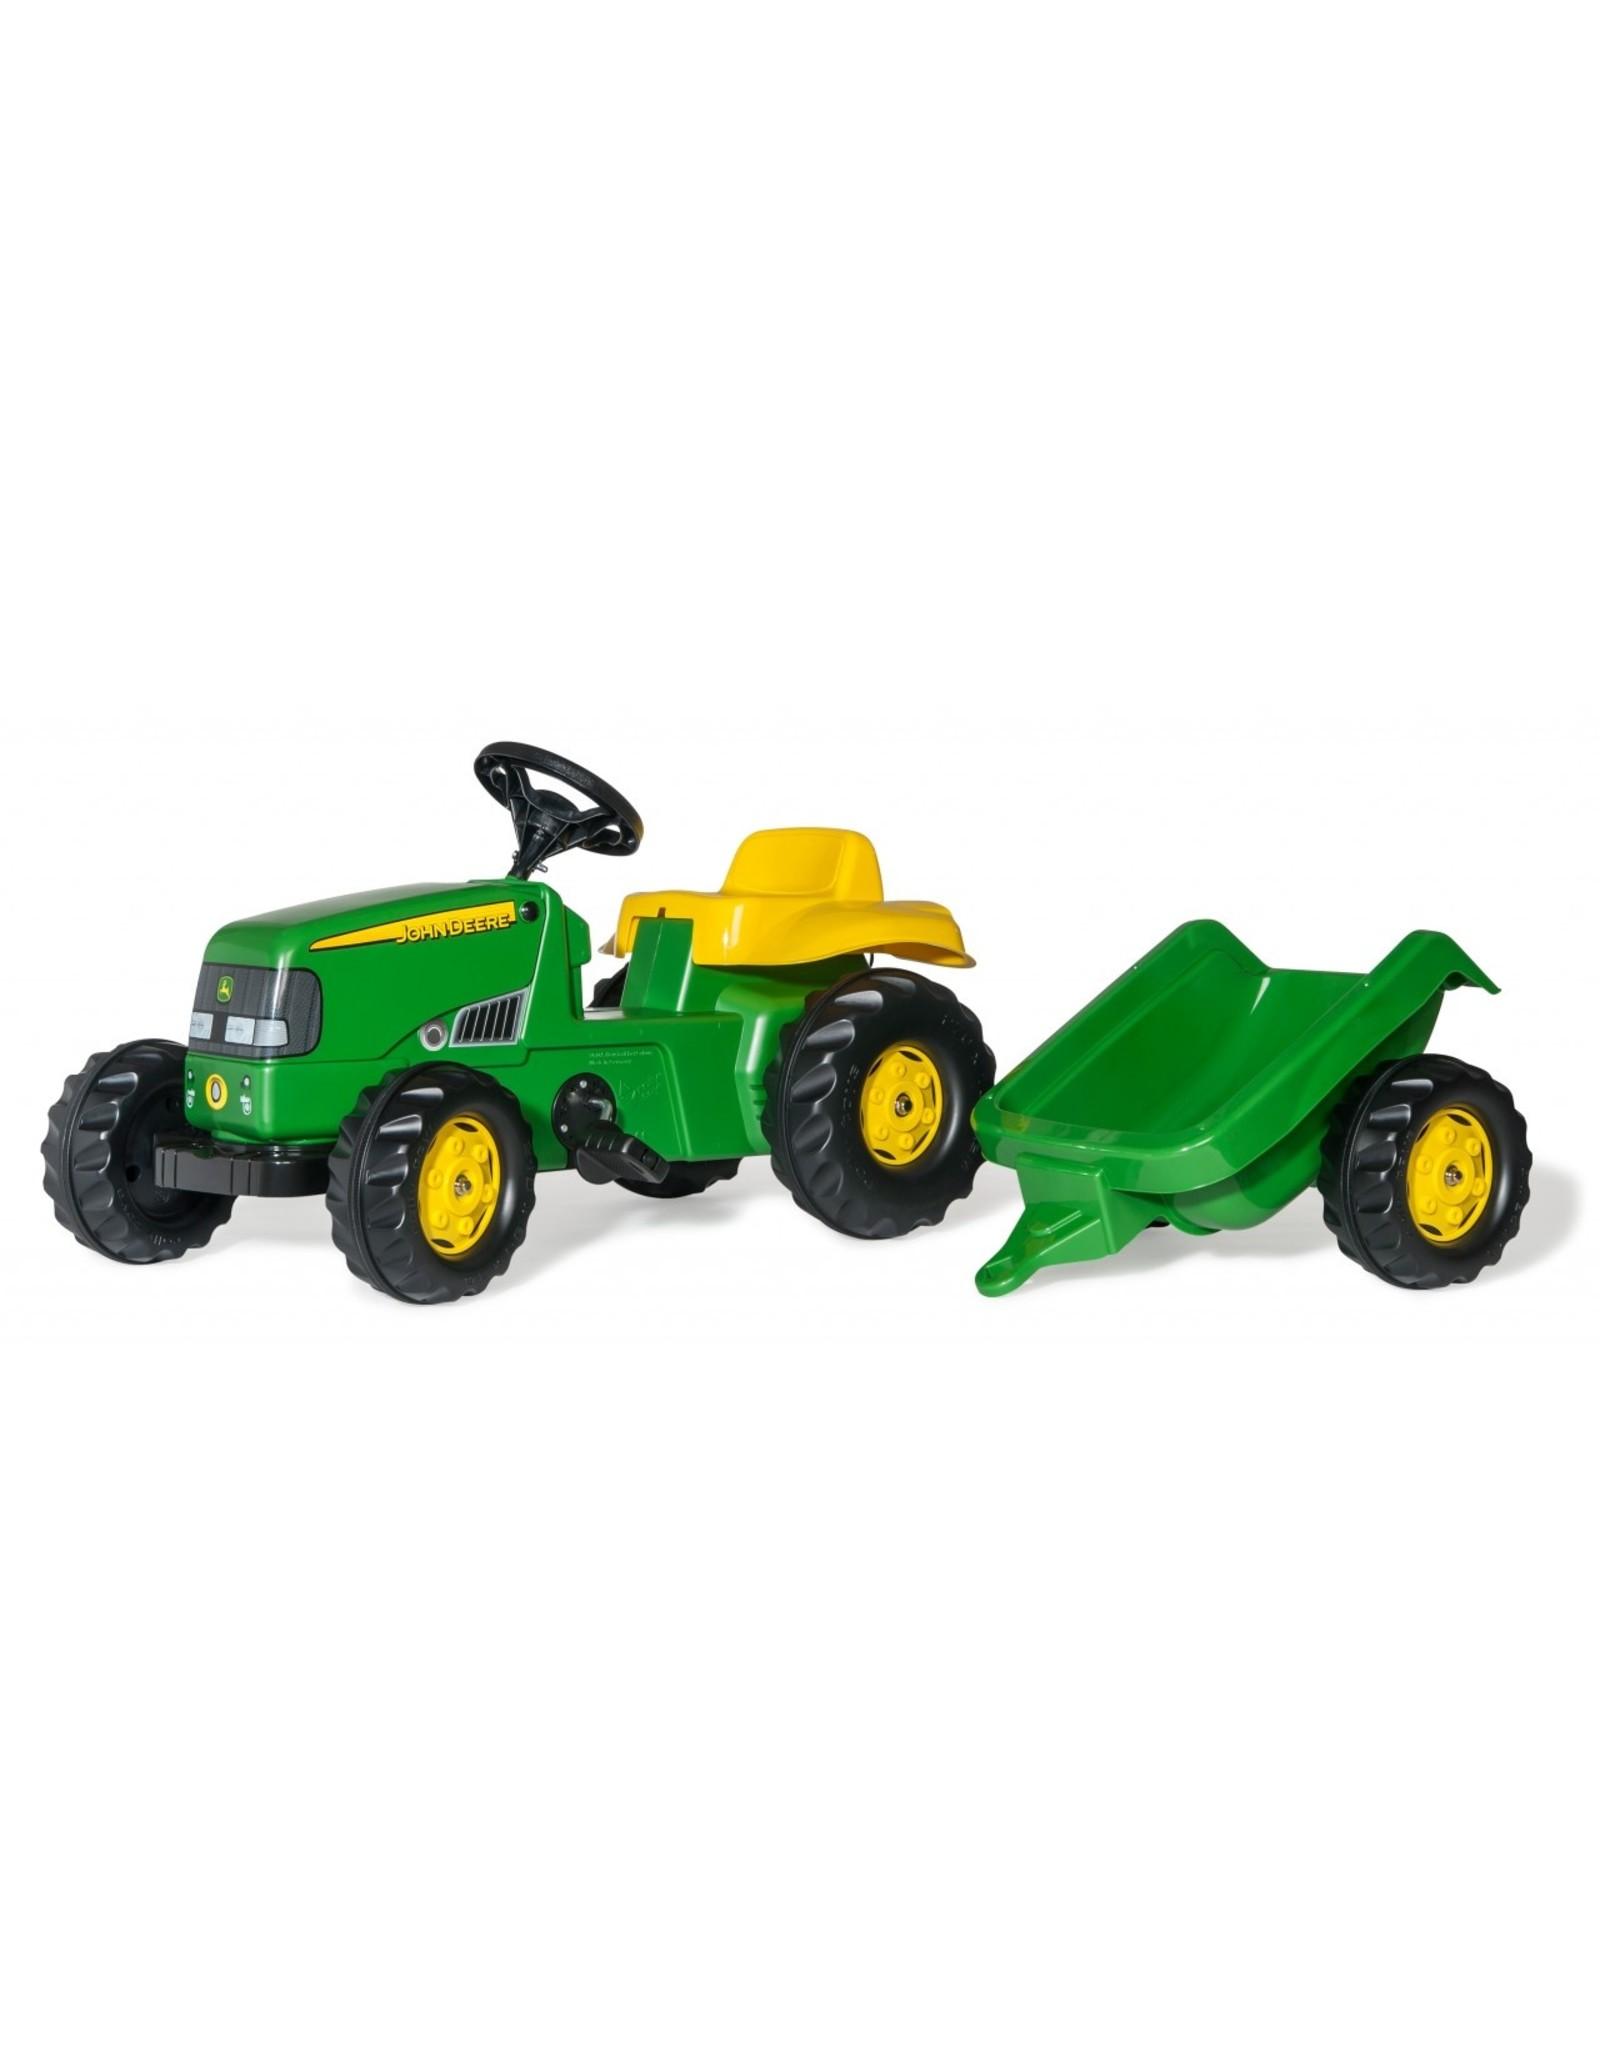 Rolly Toys Rolly toys Rollykid John deere 012190